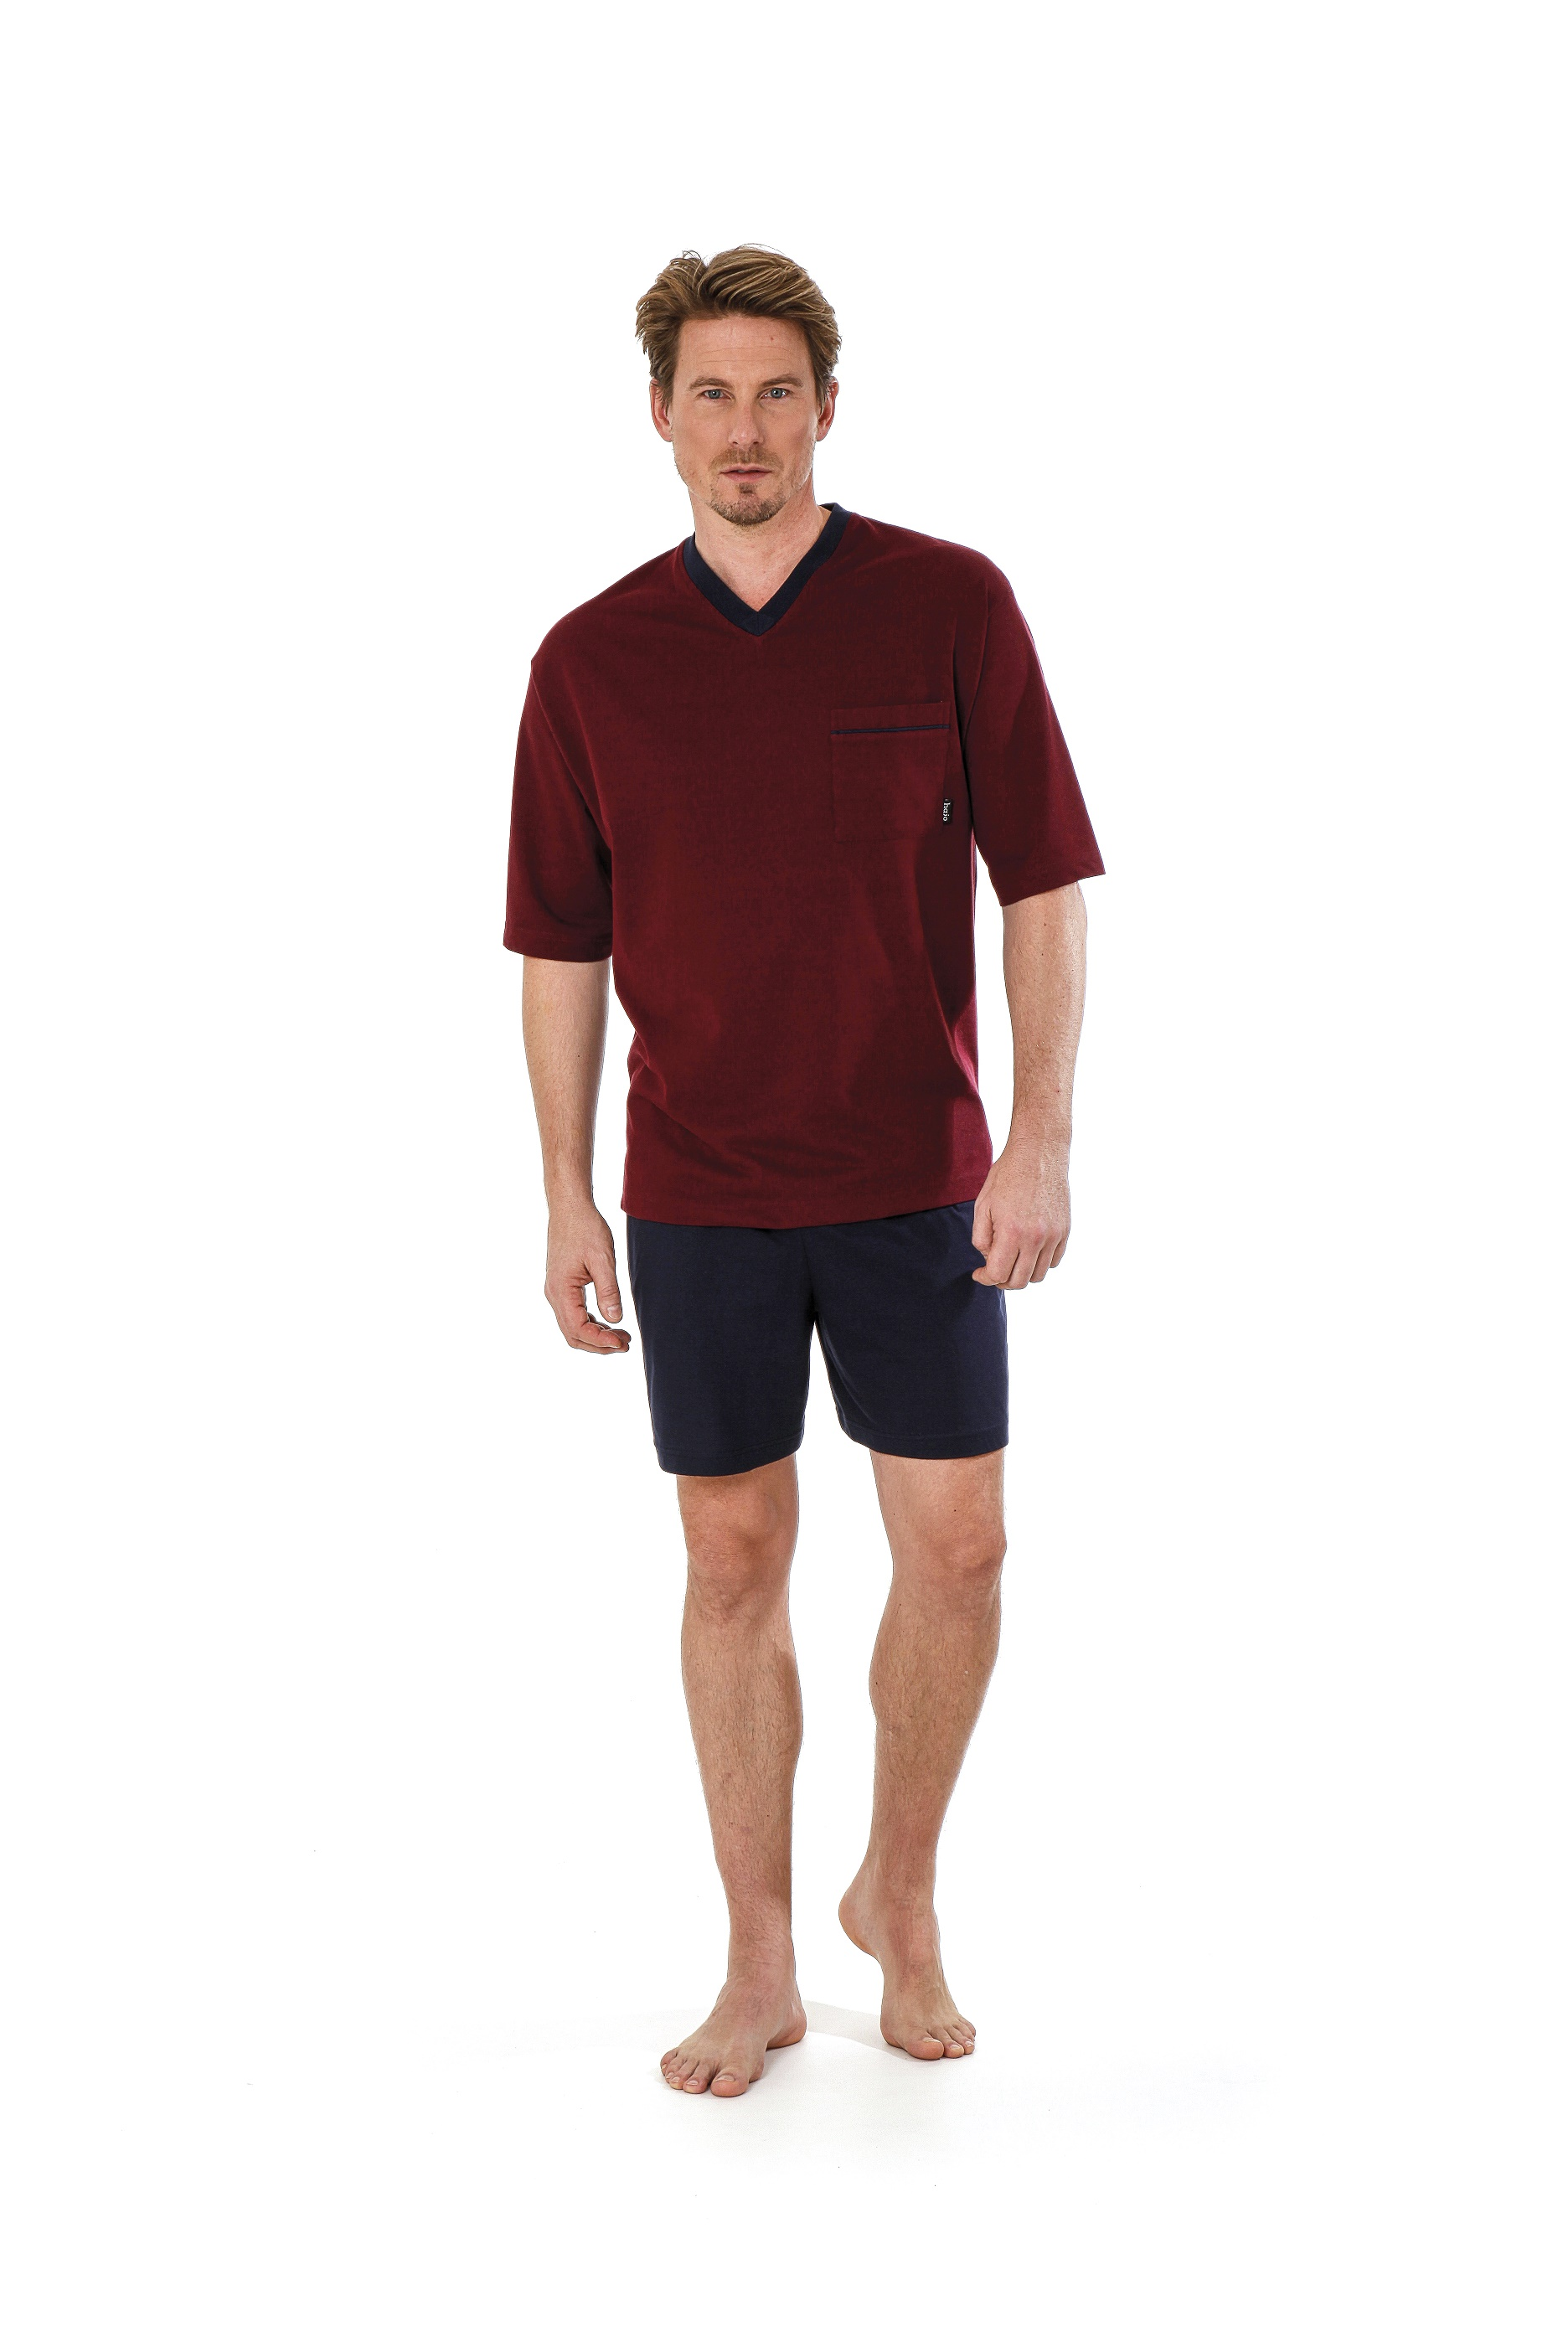 115ad81418 Betz 2 teiliger Herren Shorty Schlafanzug Pyjama kurz Farbe: bordeaux-rot  Größen: 48-56